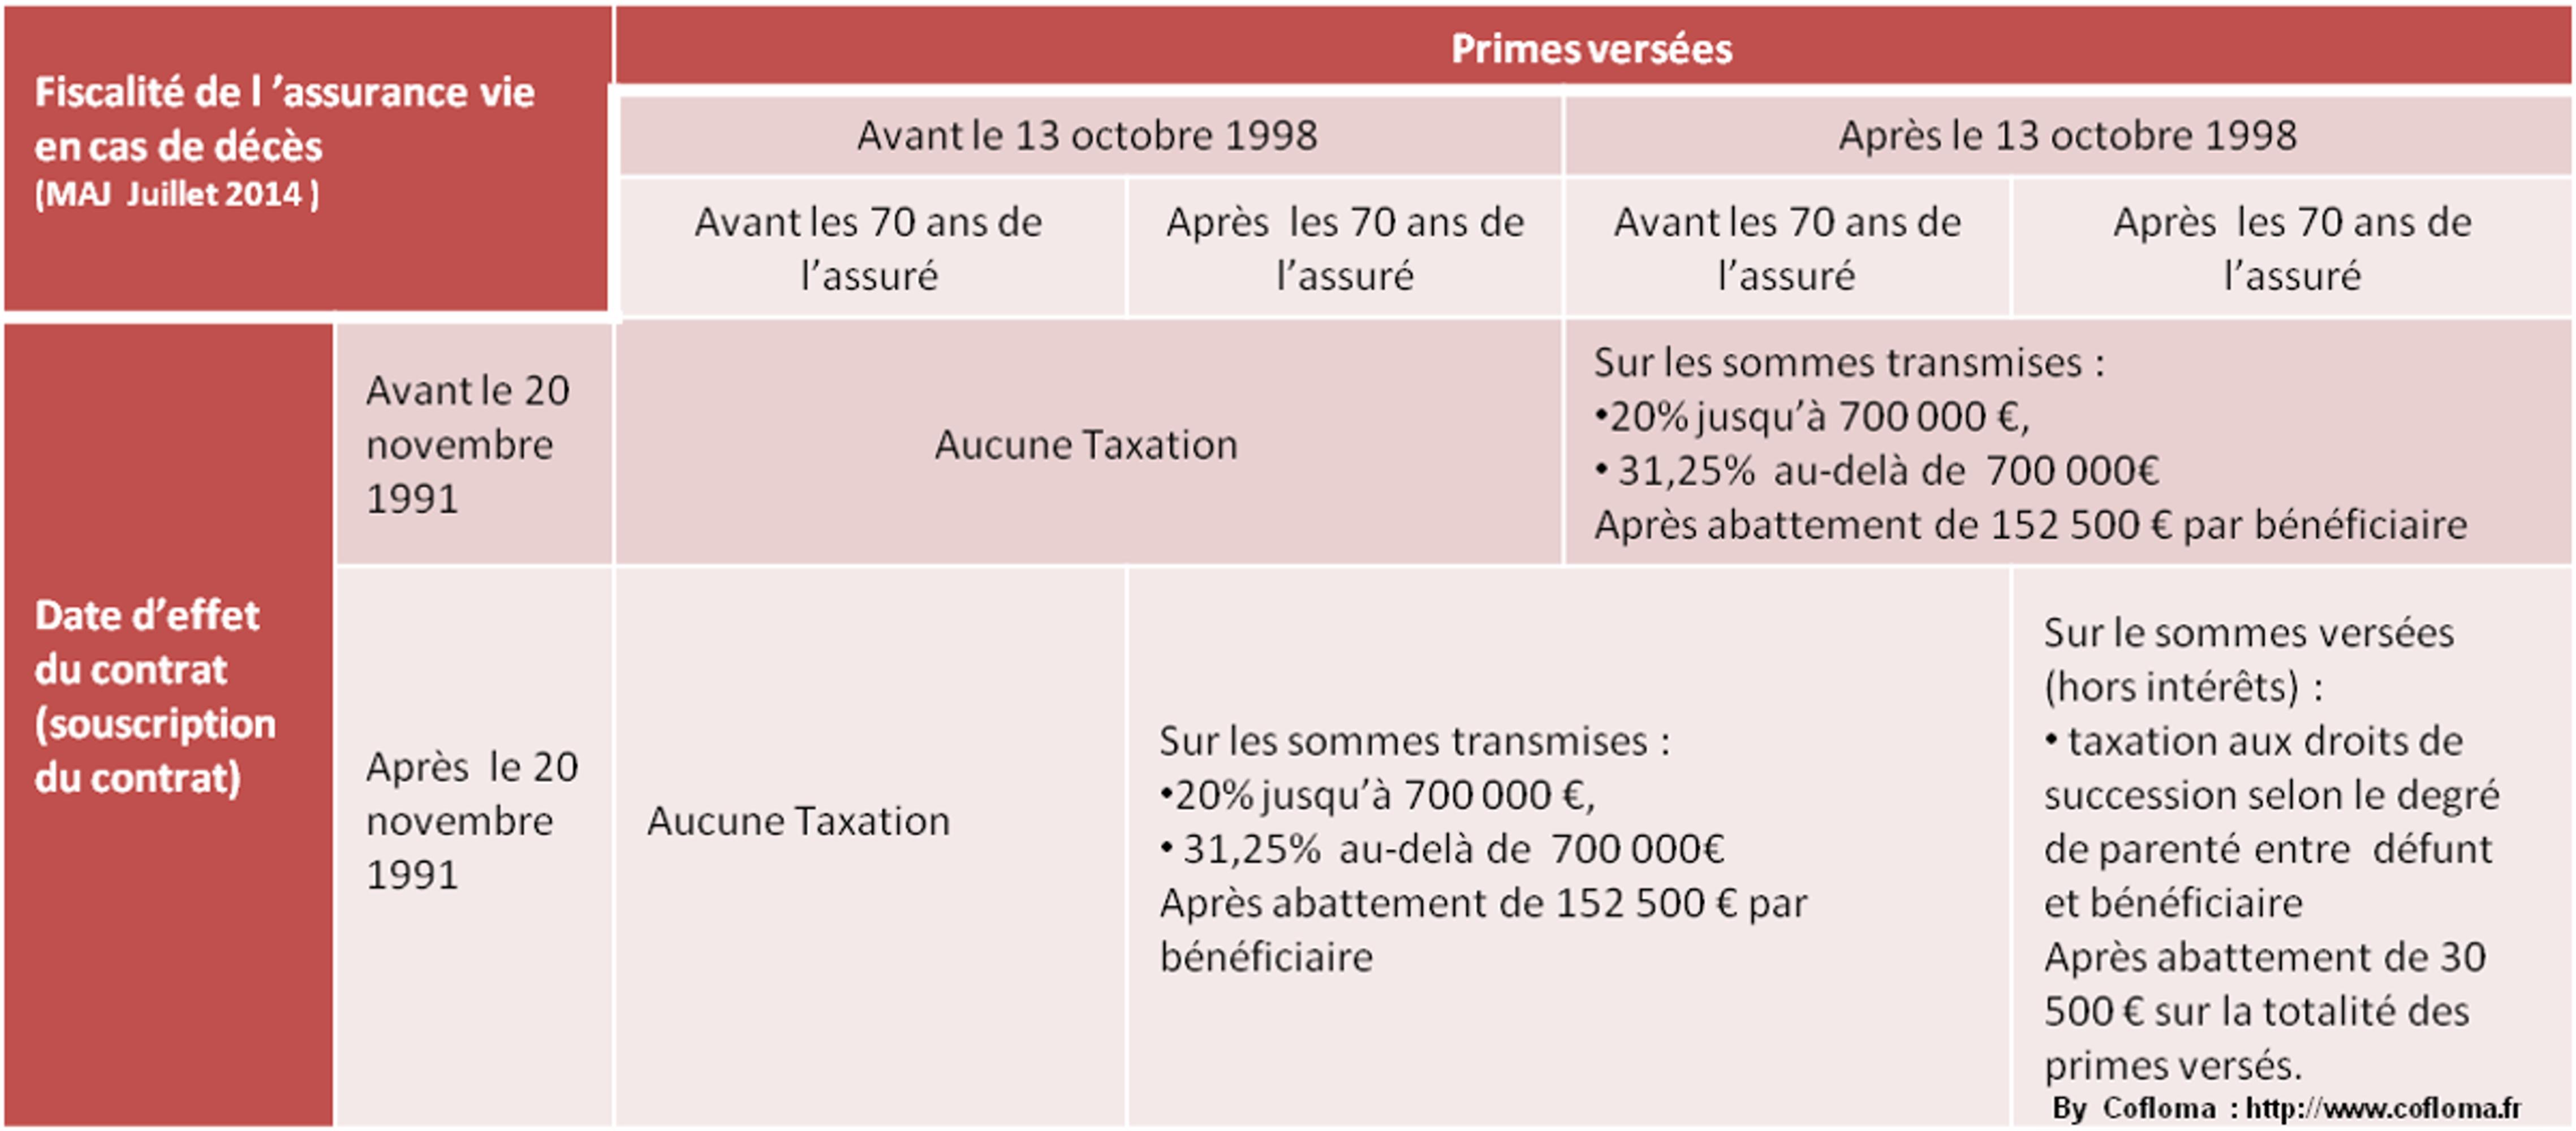 savoir choisir sa fiscalit 233 assurance vie contrats en euros multisupports non r 233 sidents dsk